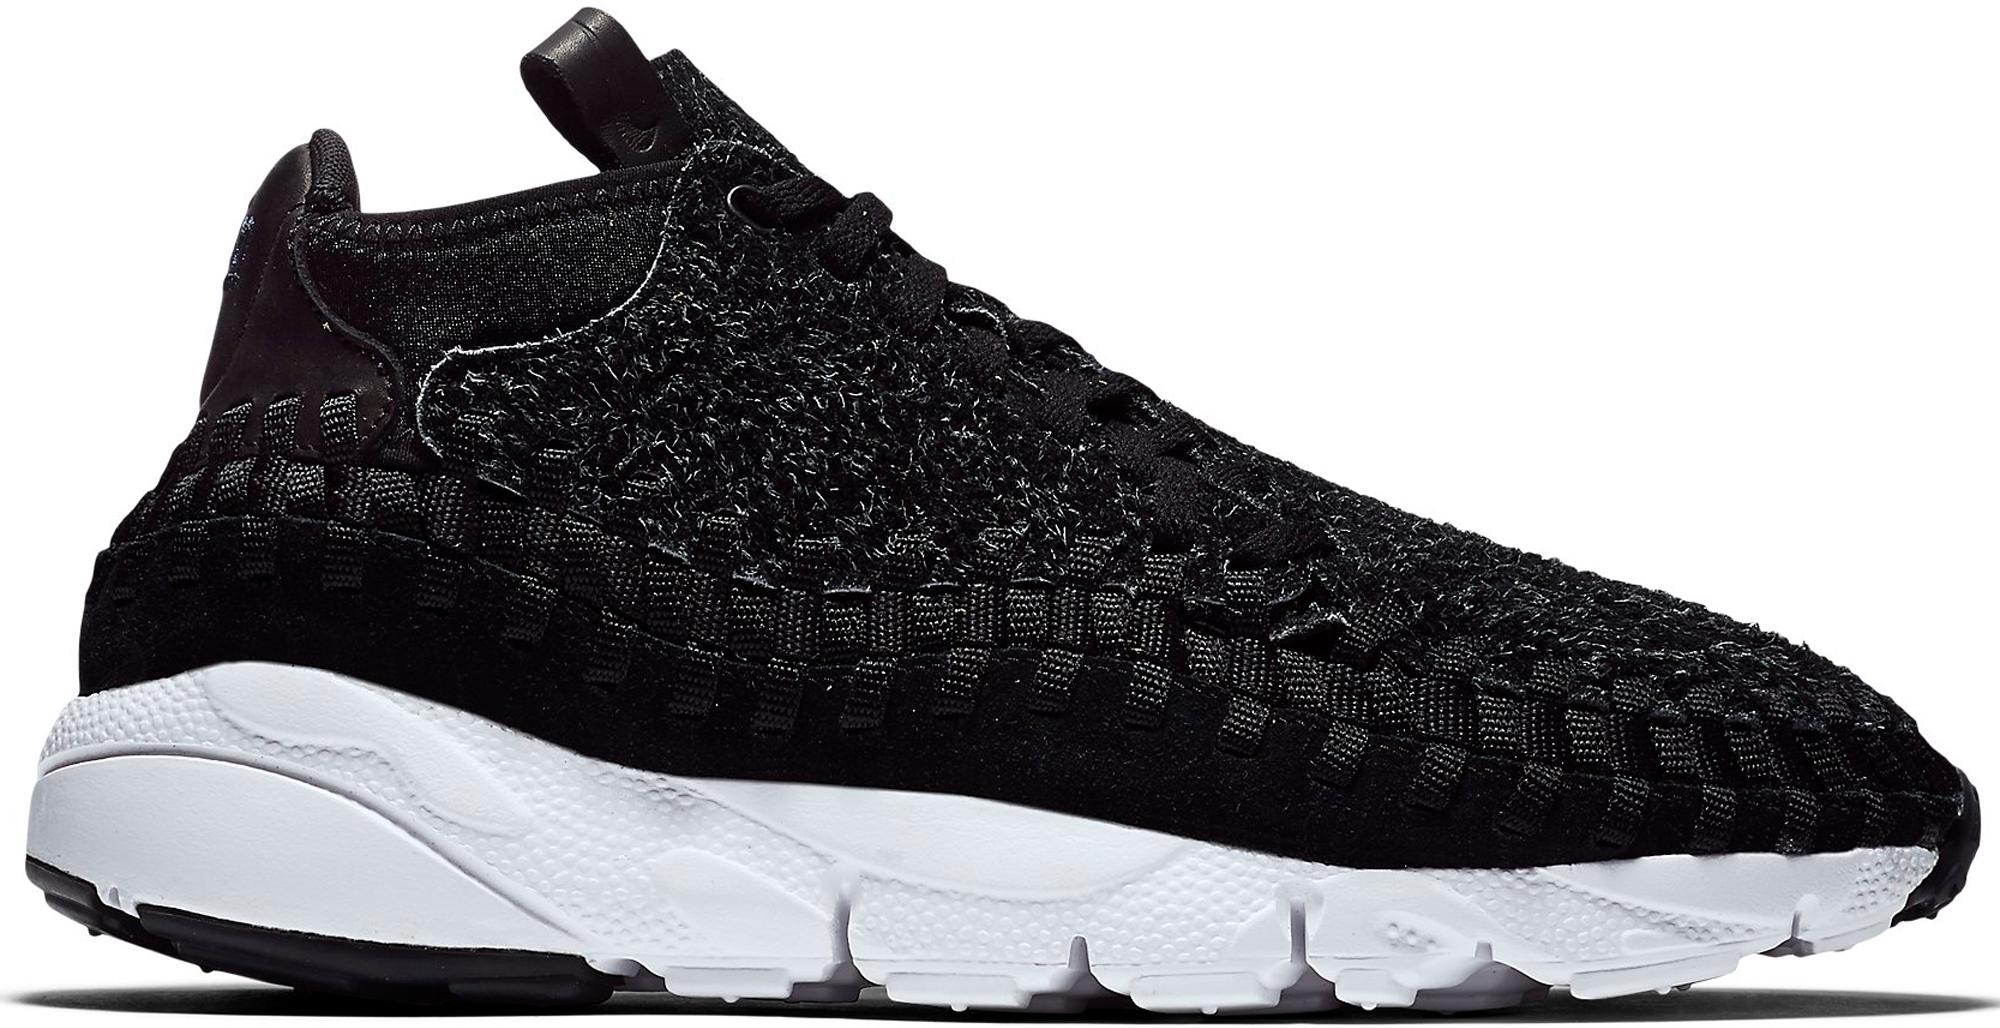 Nike Air Footscape Woven Chukka Black